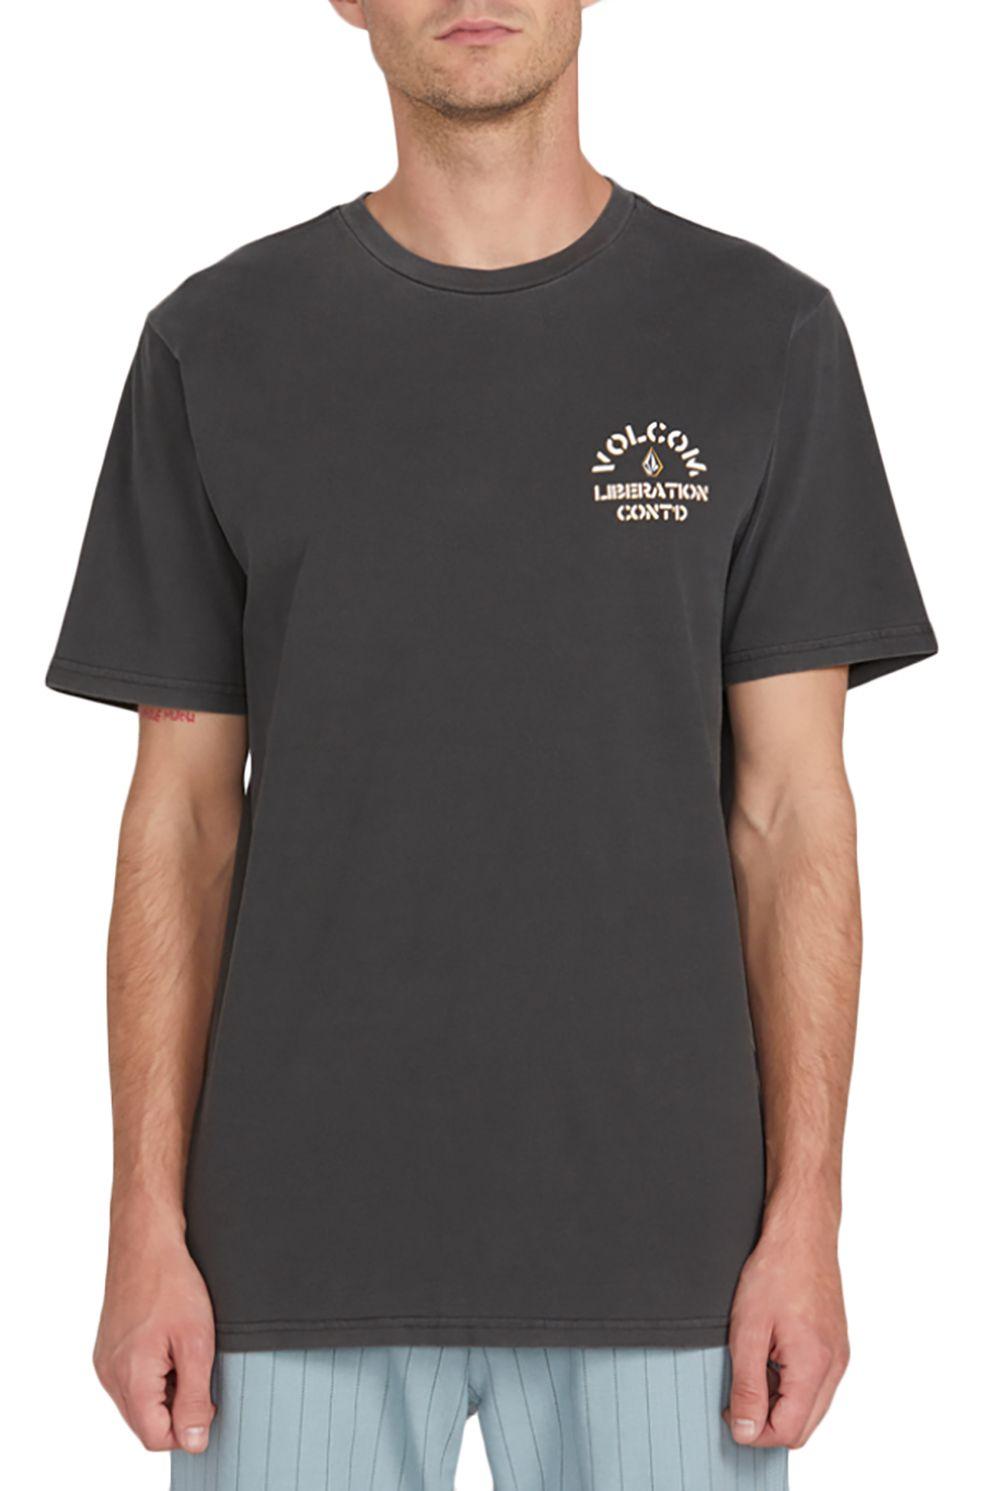 T-Shirt Volcom CJ COLLINS Black